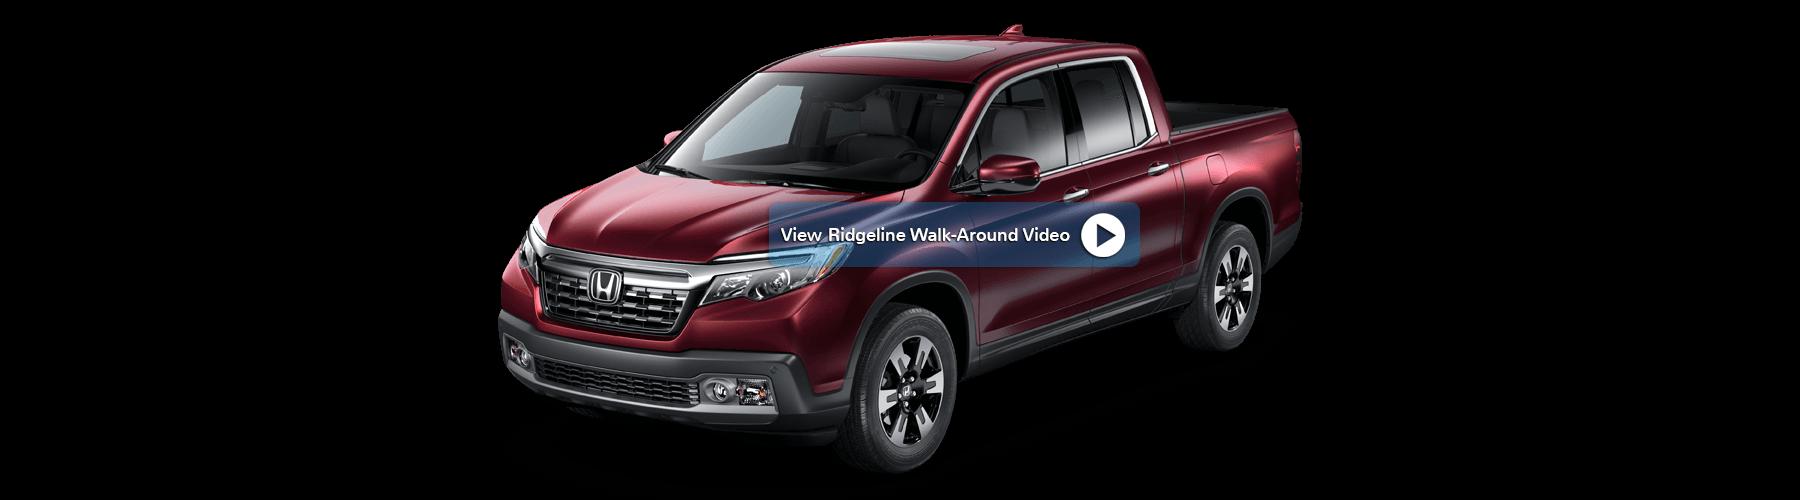 2017 Honda Ridgeline Front Angle